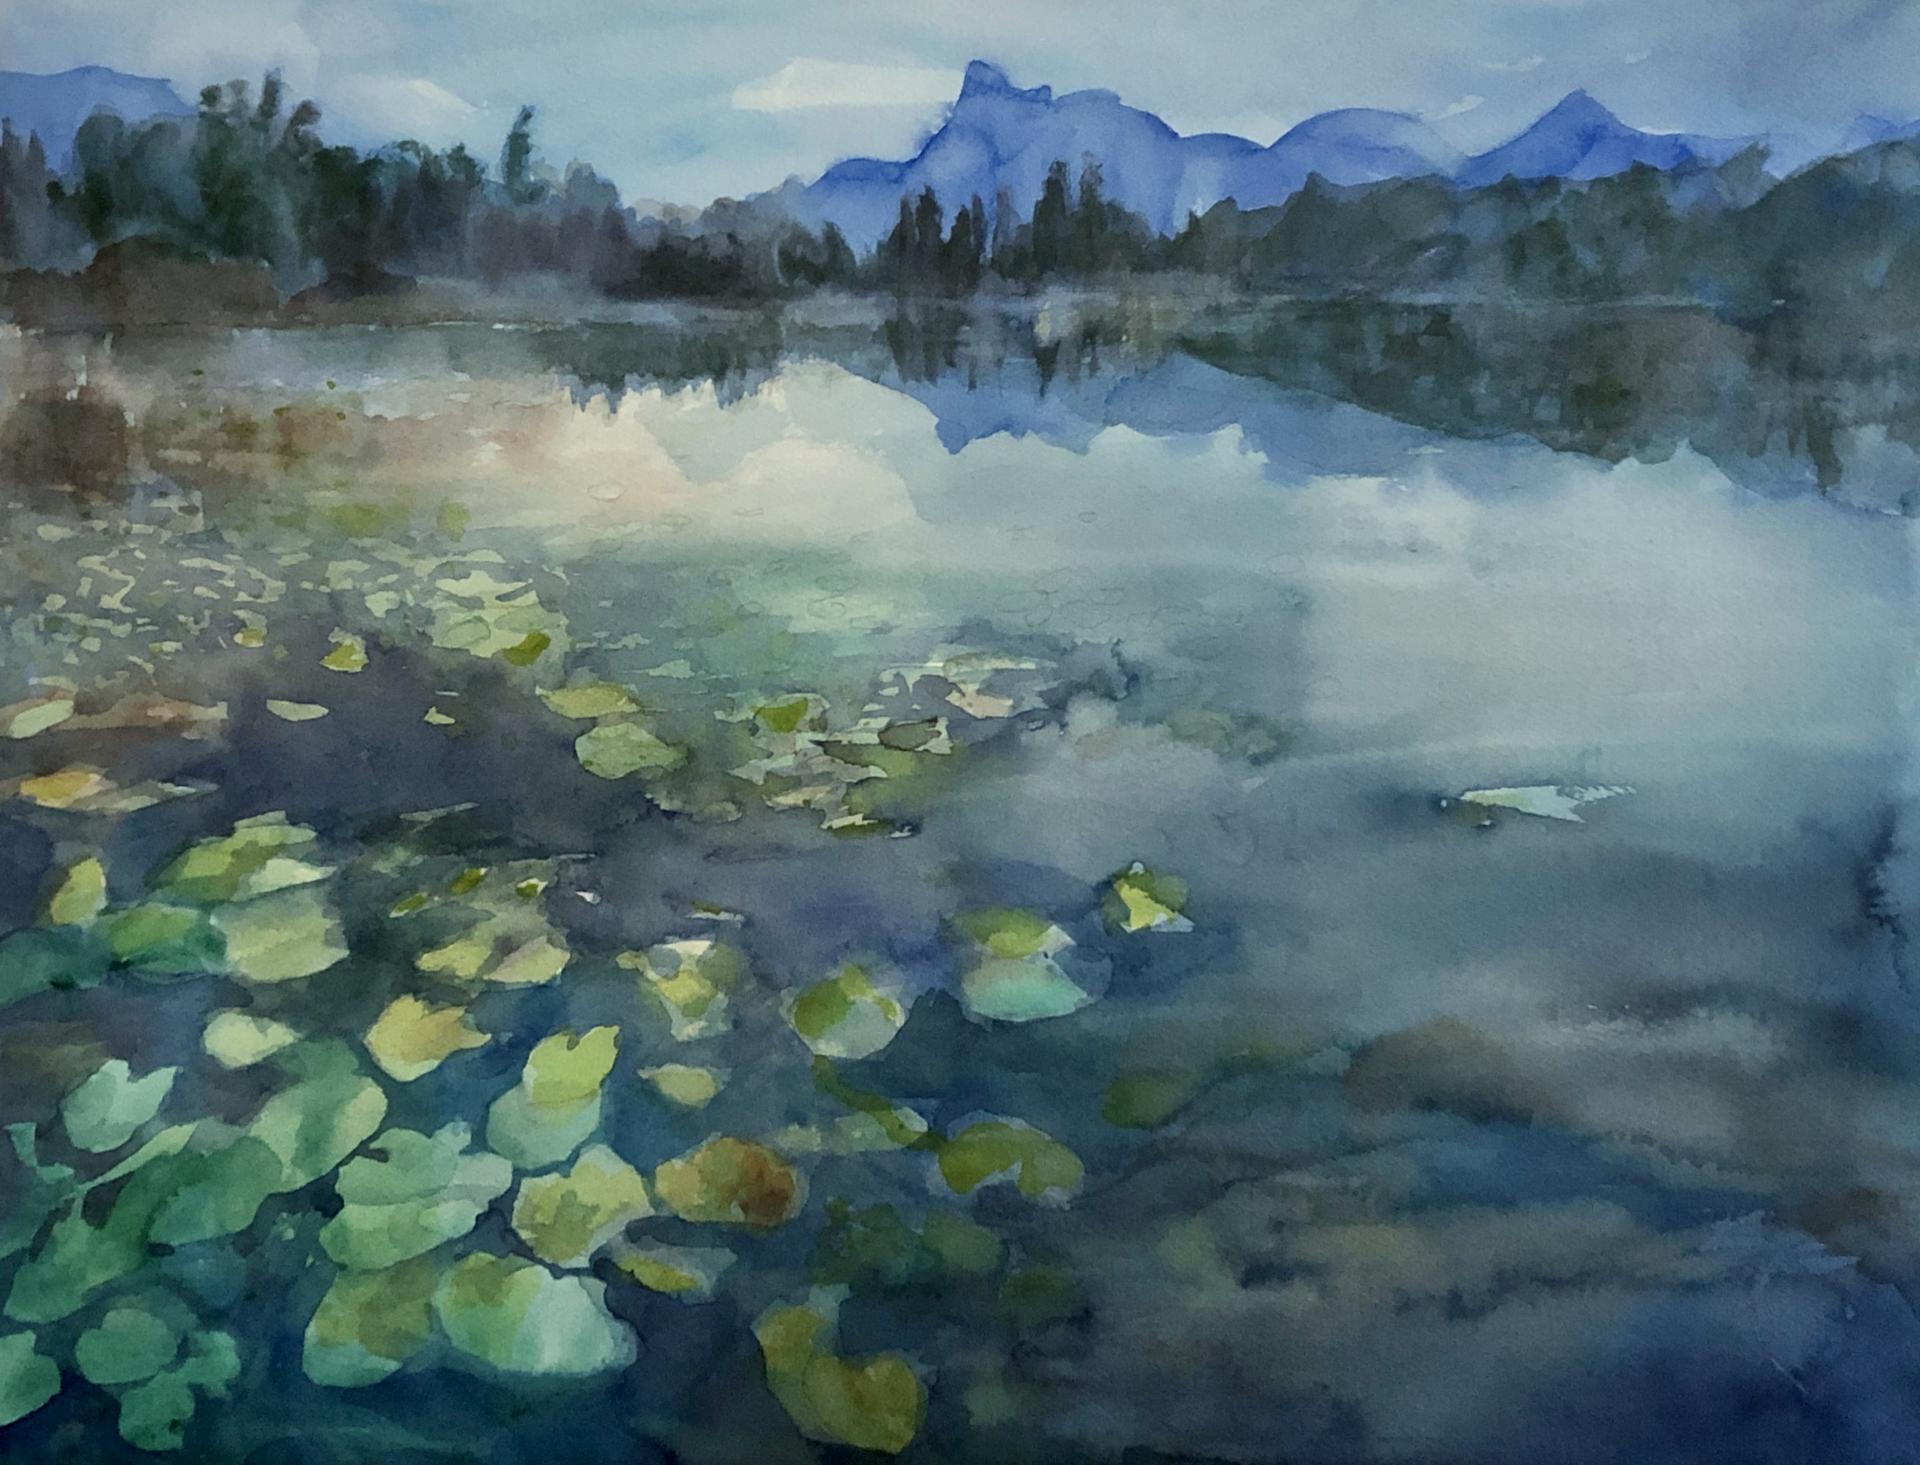 MOUNTAIN LAKE with thanks to Benjamin Waldmann